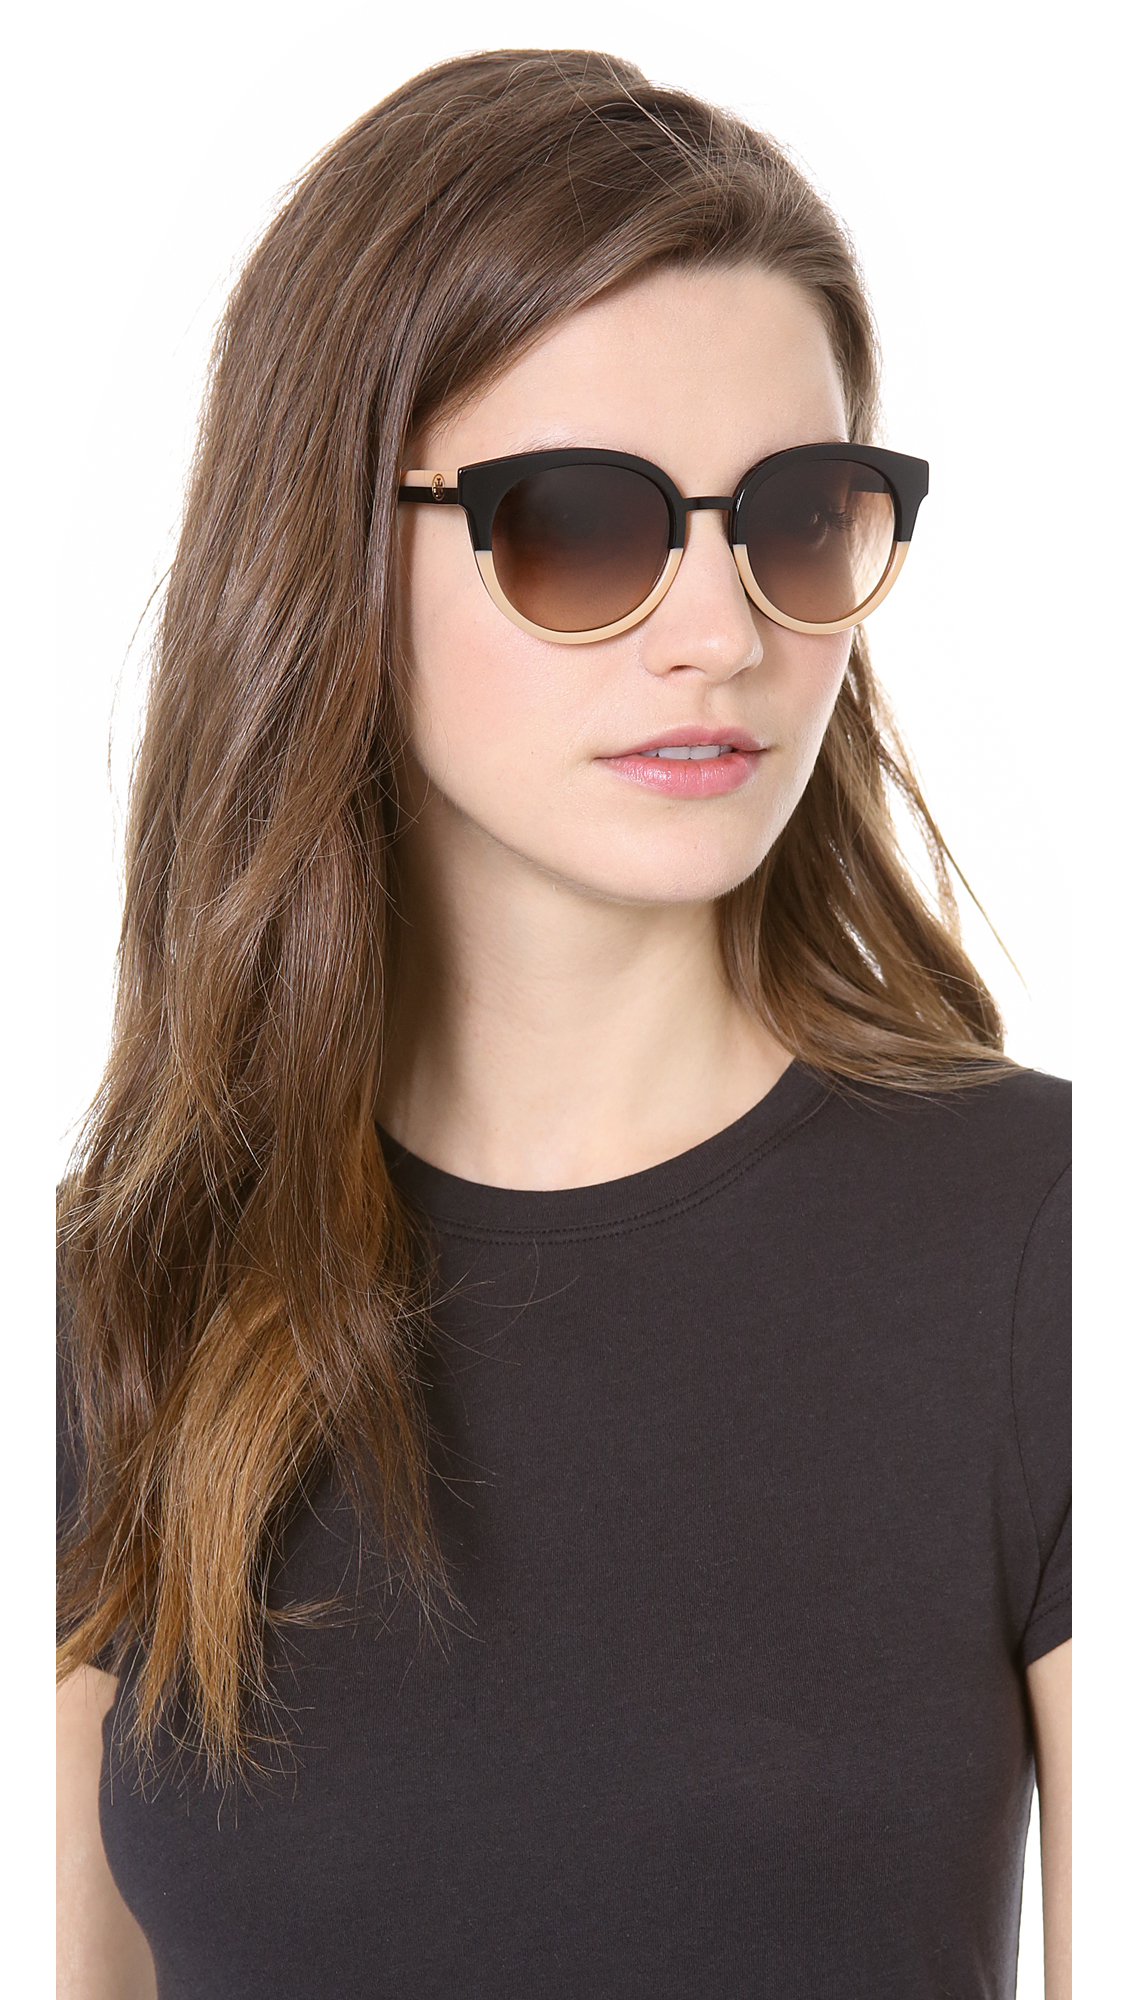 48d9957adb Lyst - Tory Burch Eclectic Sunglasses in Black